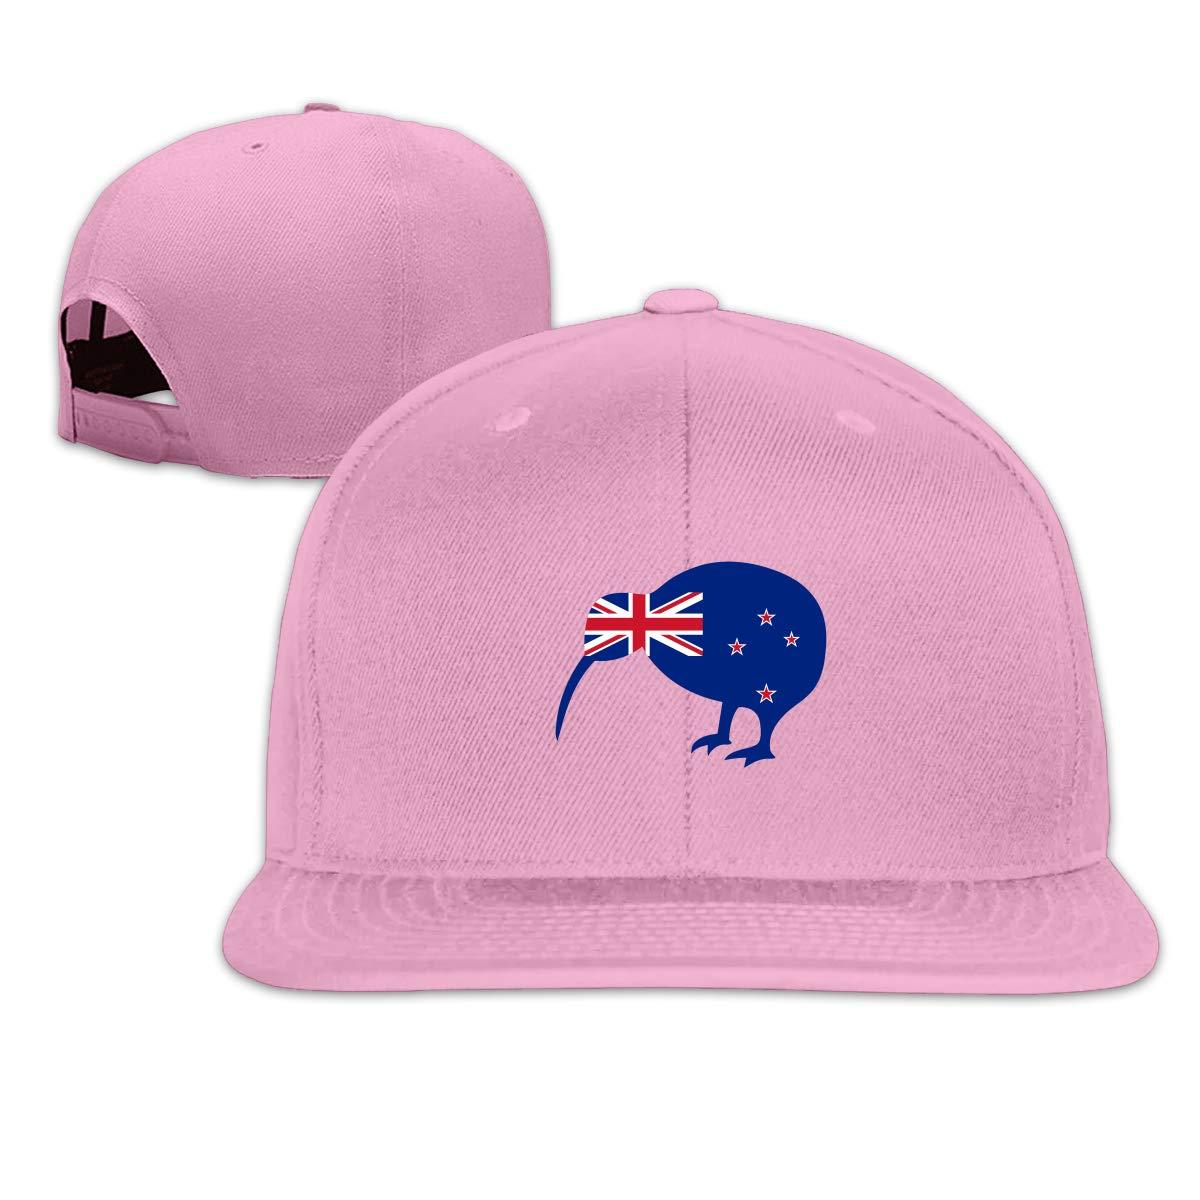 MOCSTONE Unisex Snapback Hat New Zealand Kiwi Bird Adjustable Baseball Cap